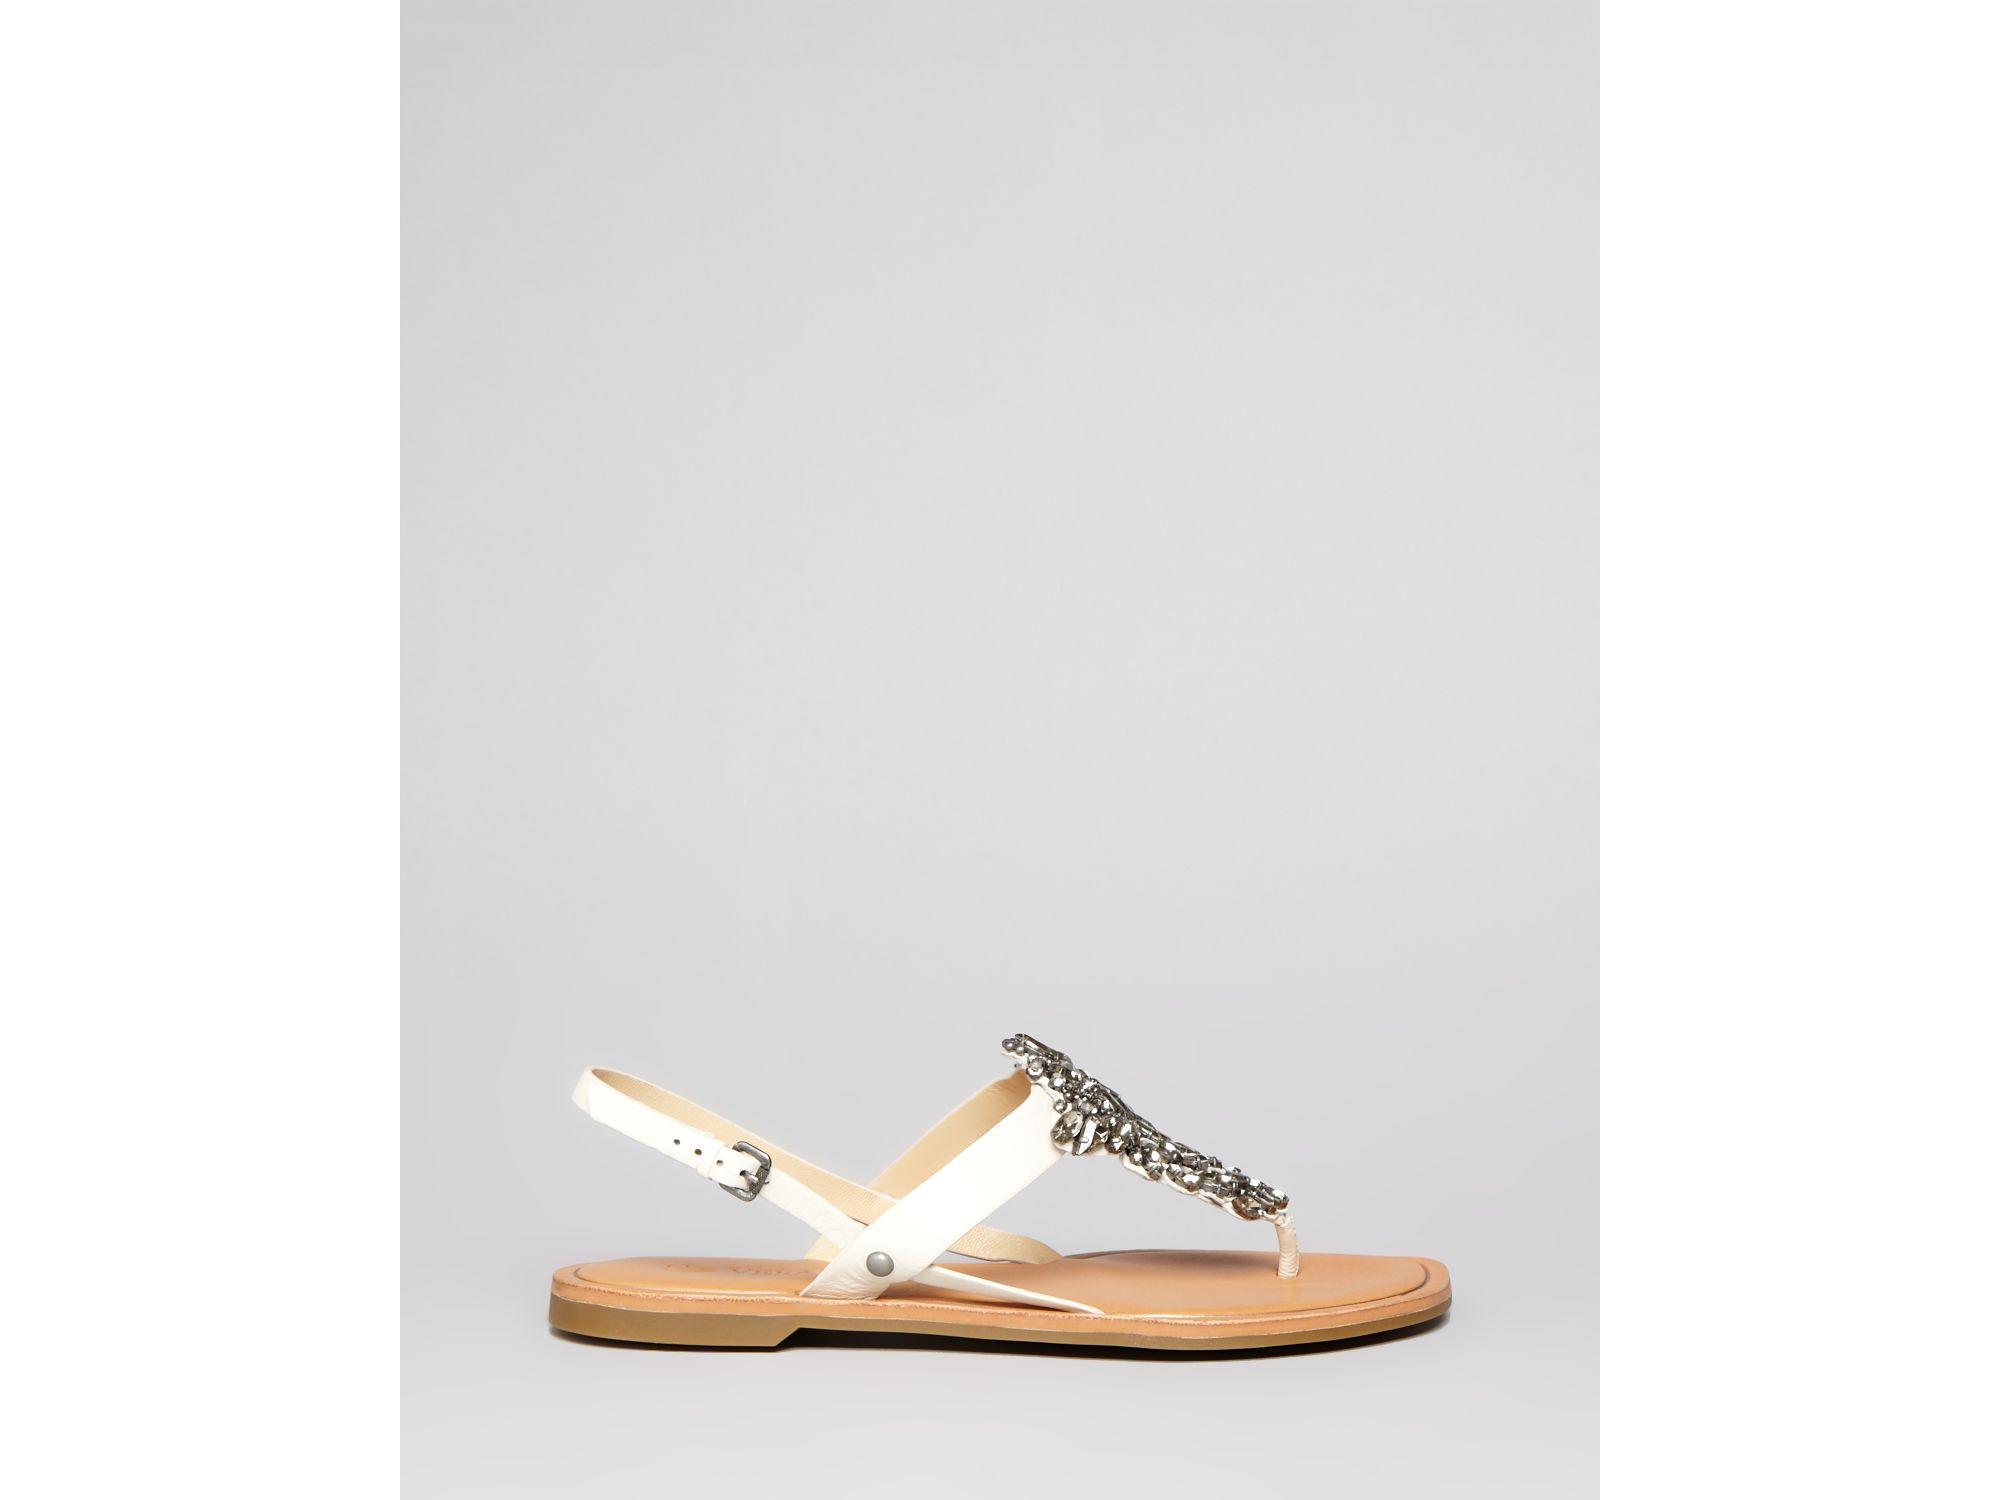 Vera Wang White Flat Shoes